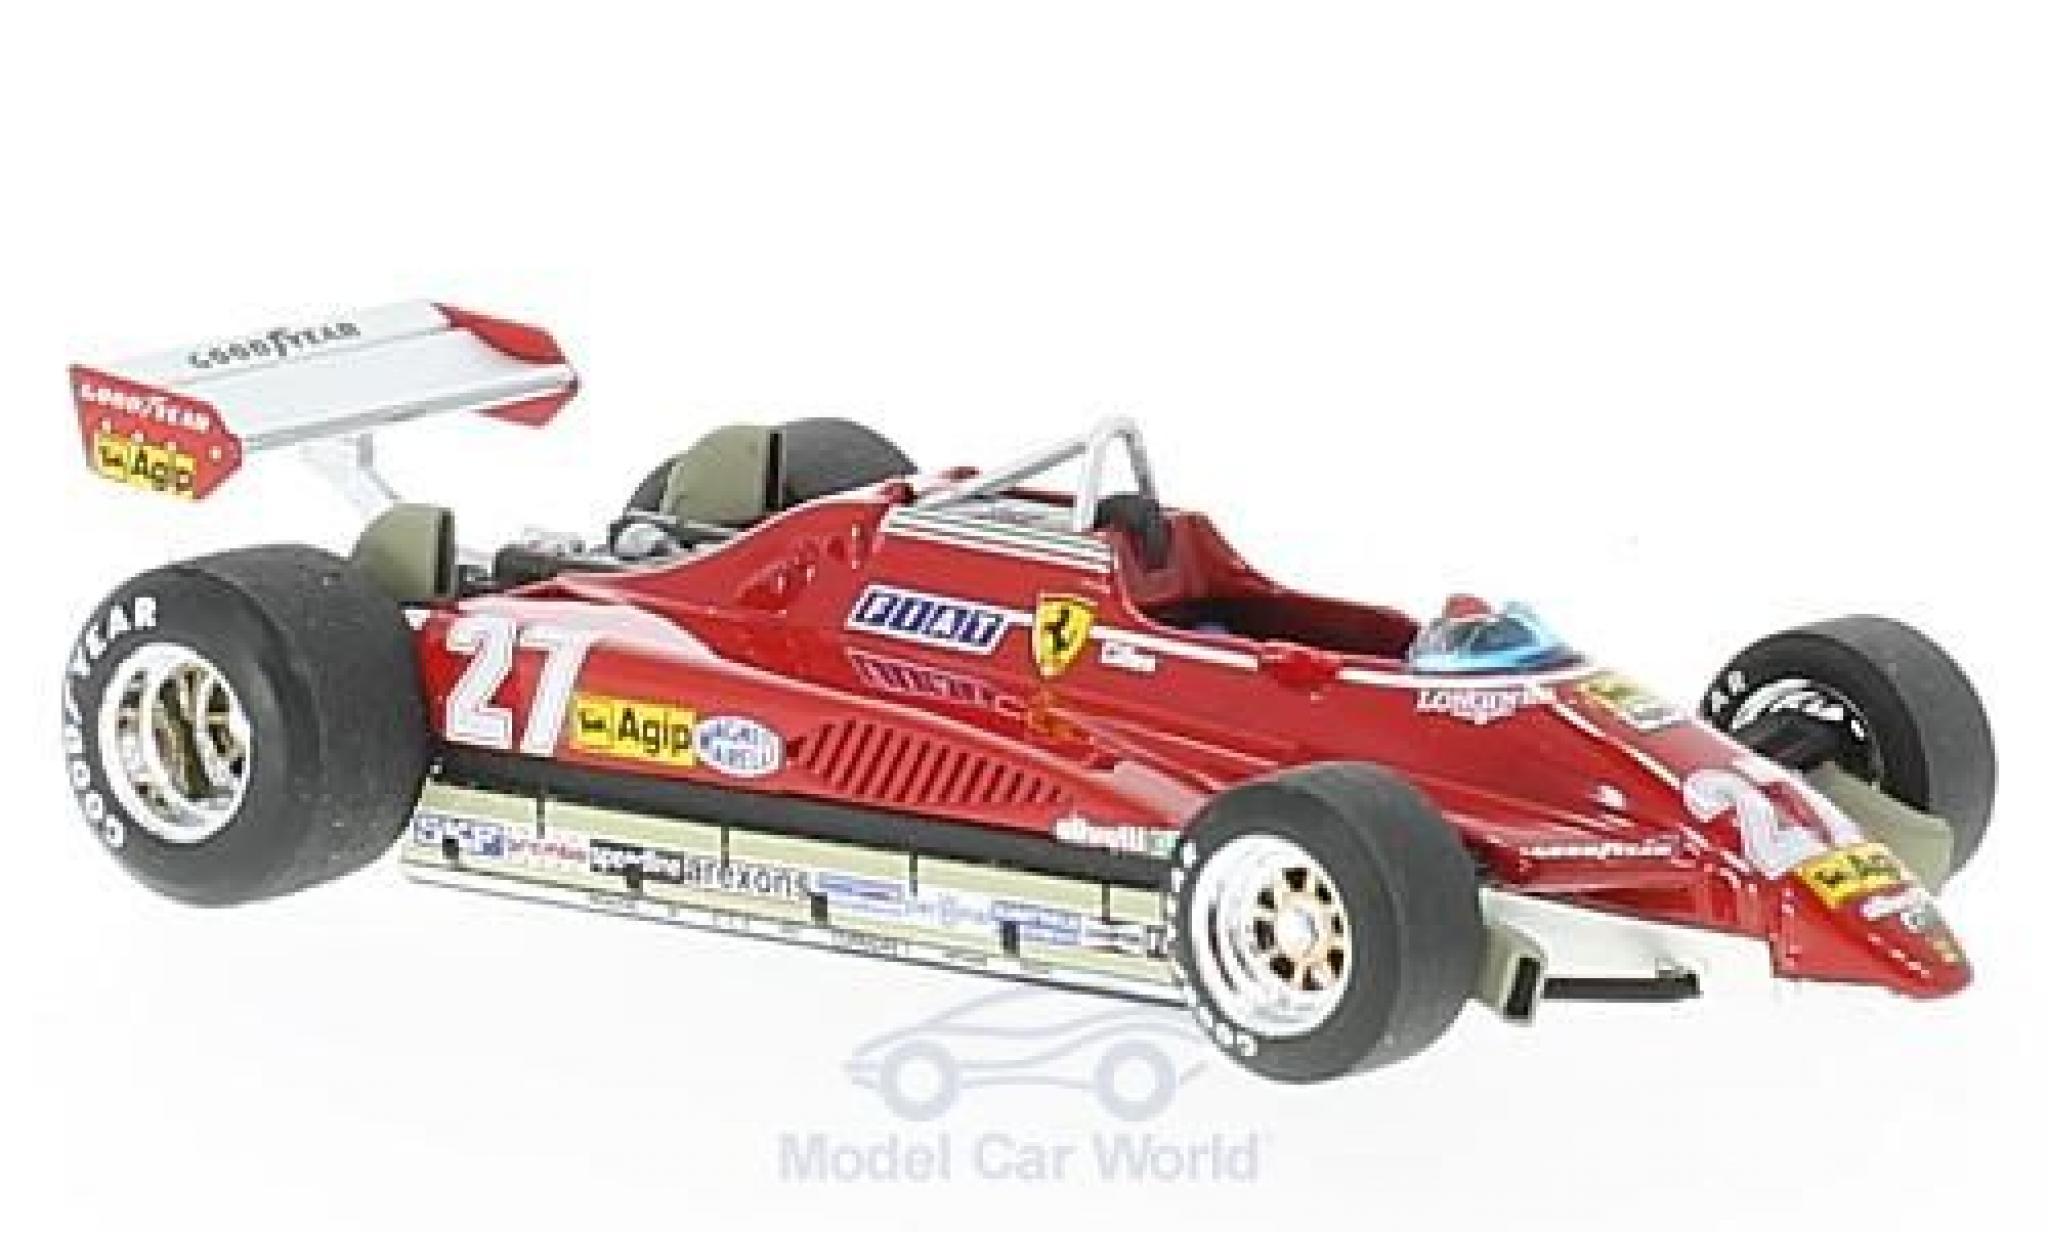 Ferrari 126 1982 1/43 Brumm C2 turbo No.27 Formel 1 GP Brasilien G.Villeneuve